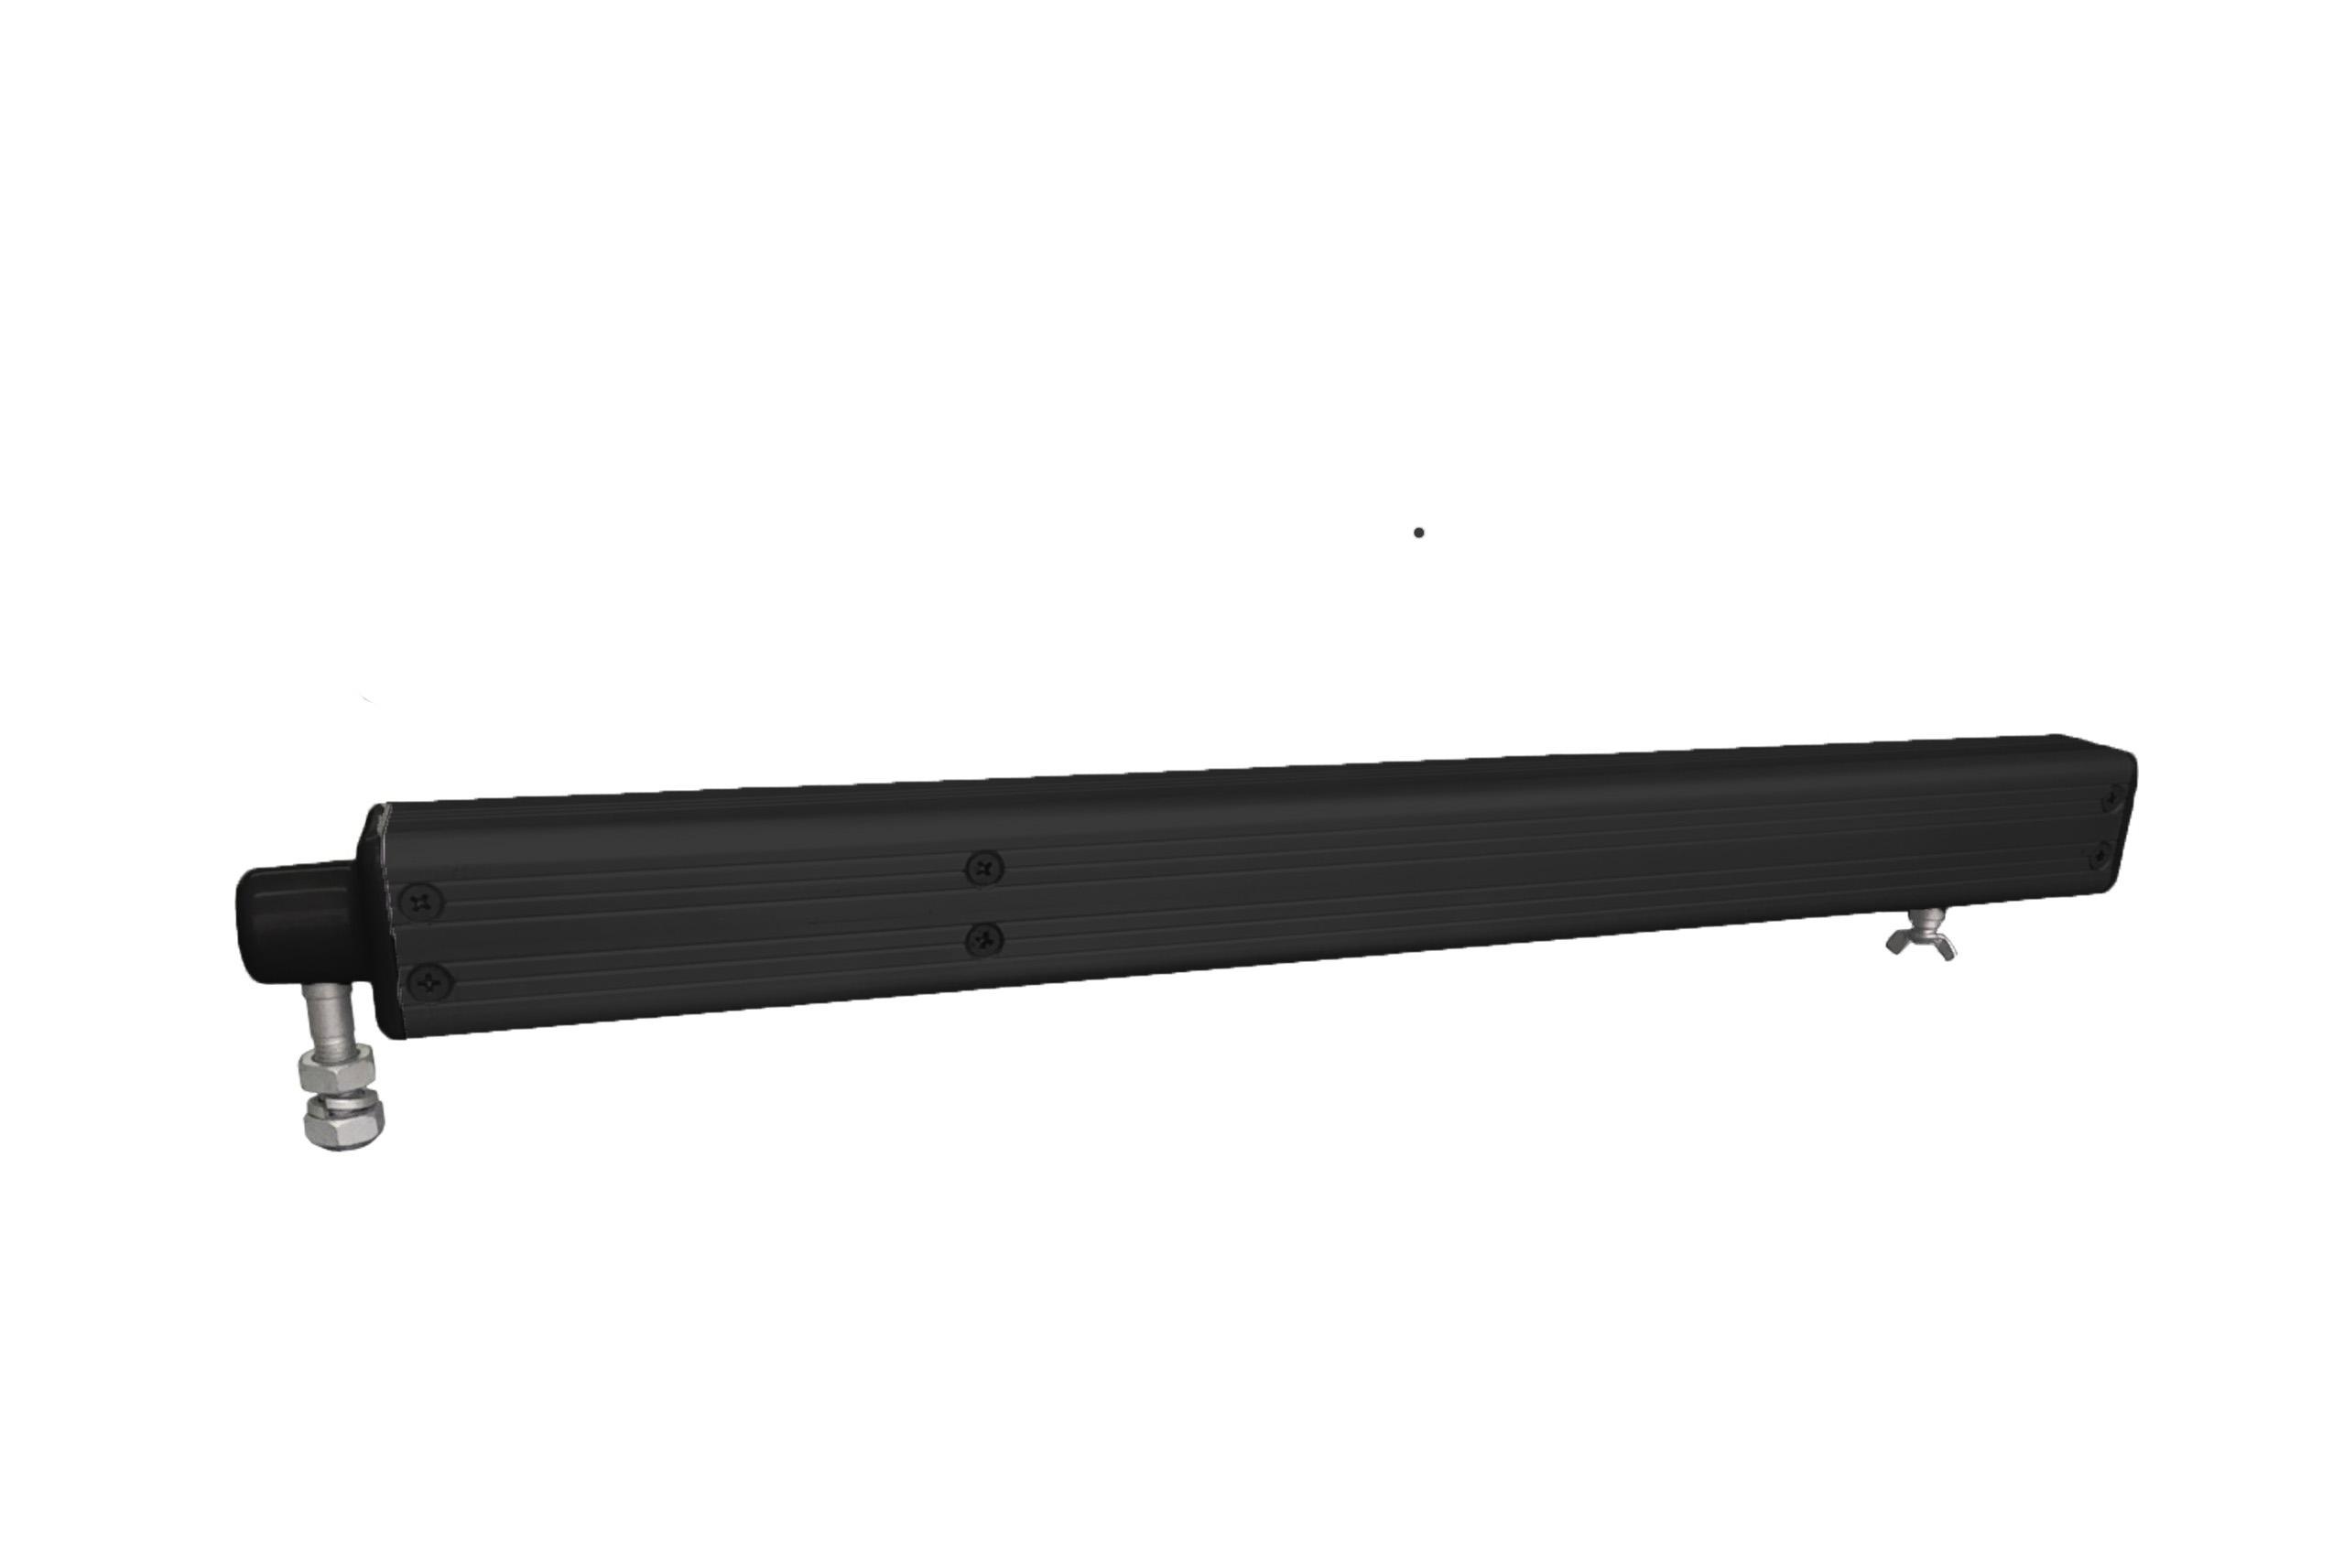 Drehtorantrieb Flügeltorantrieb SET Torantrieb Fotozellen bis zu 3,5m links